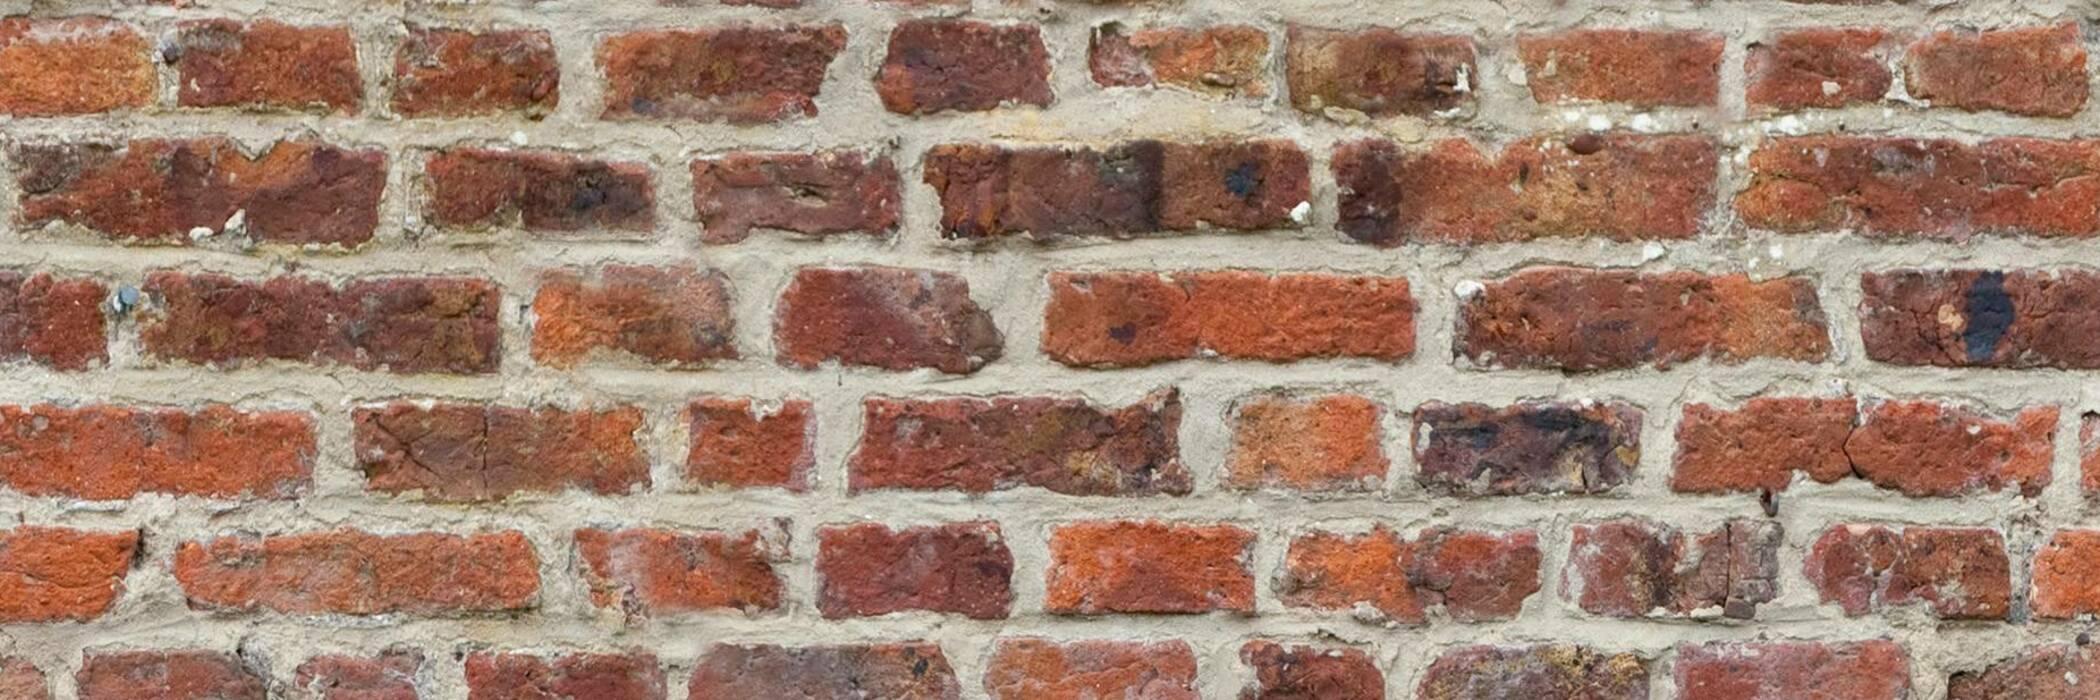 Concrete block bricks hero